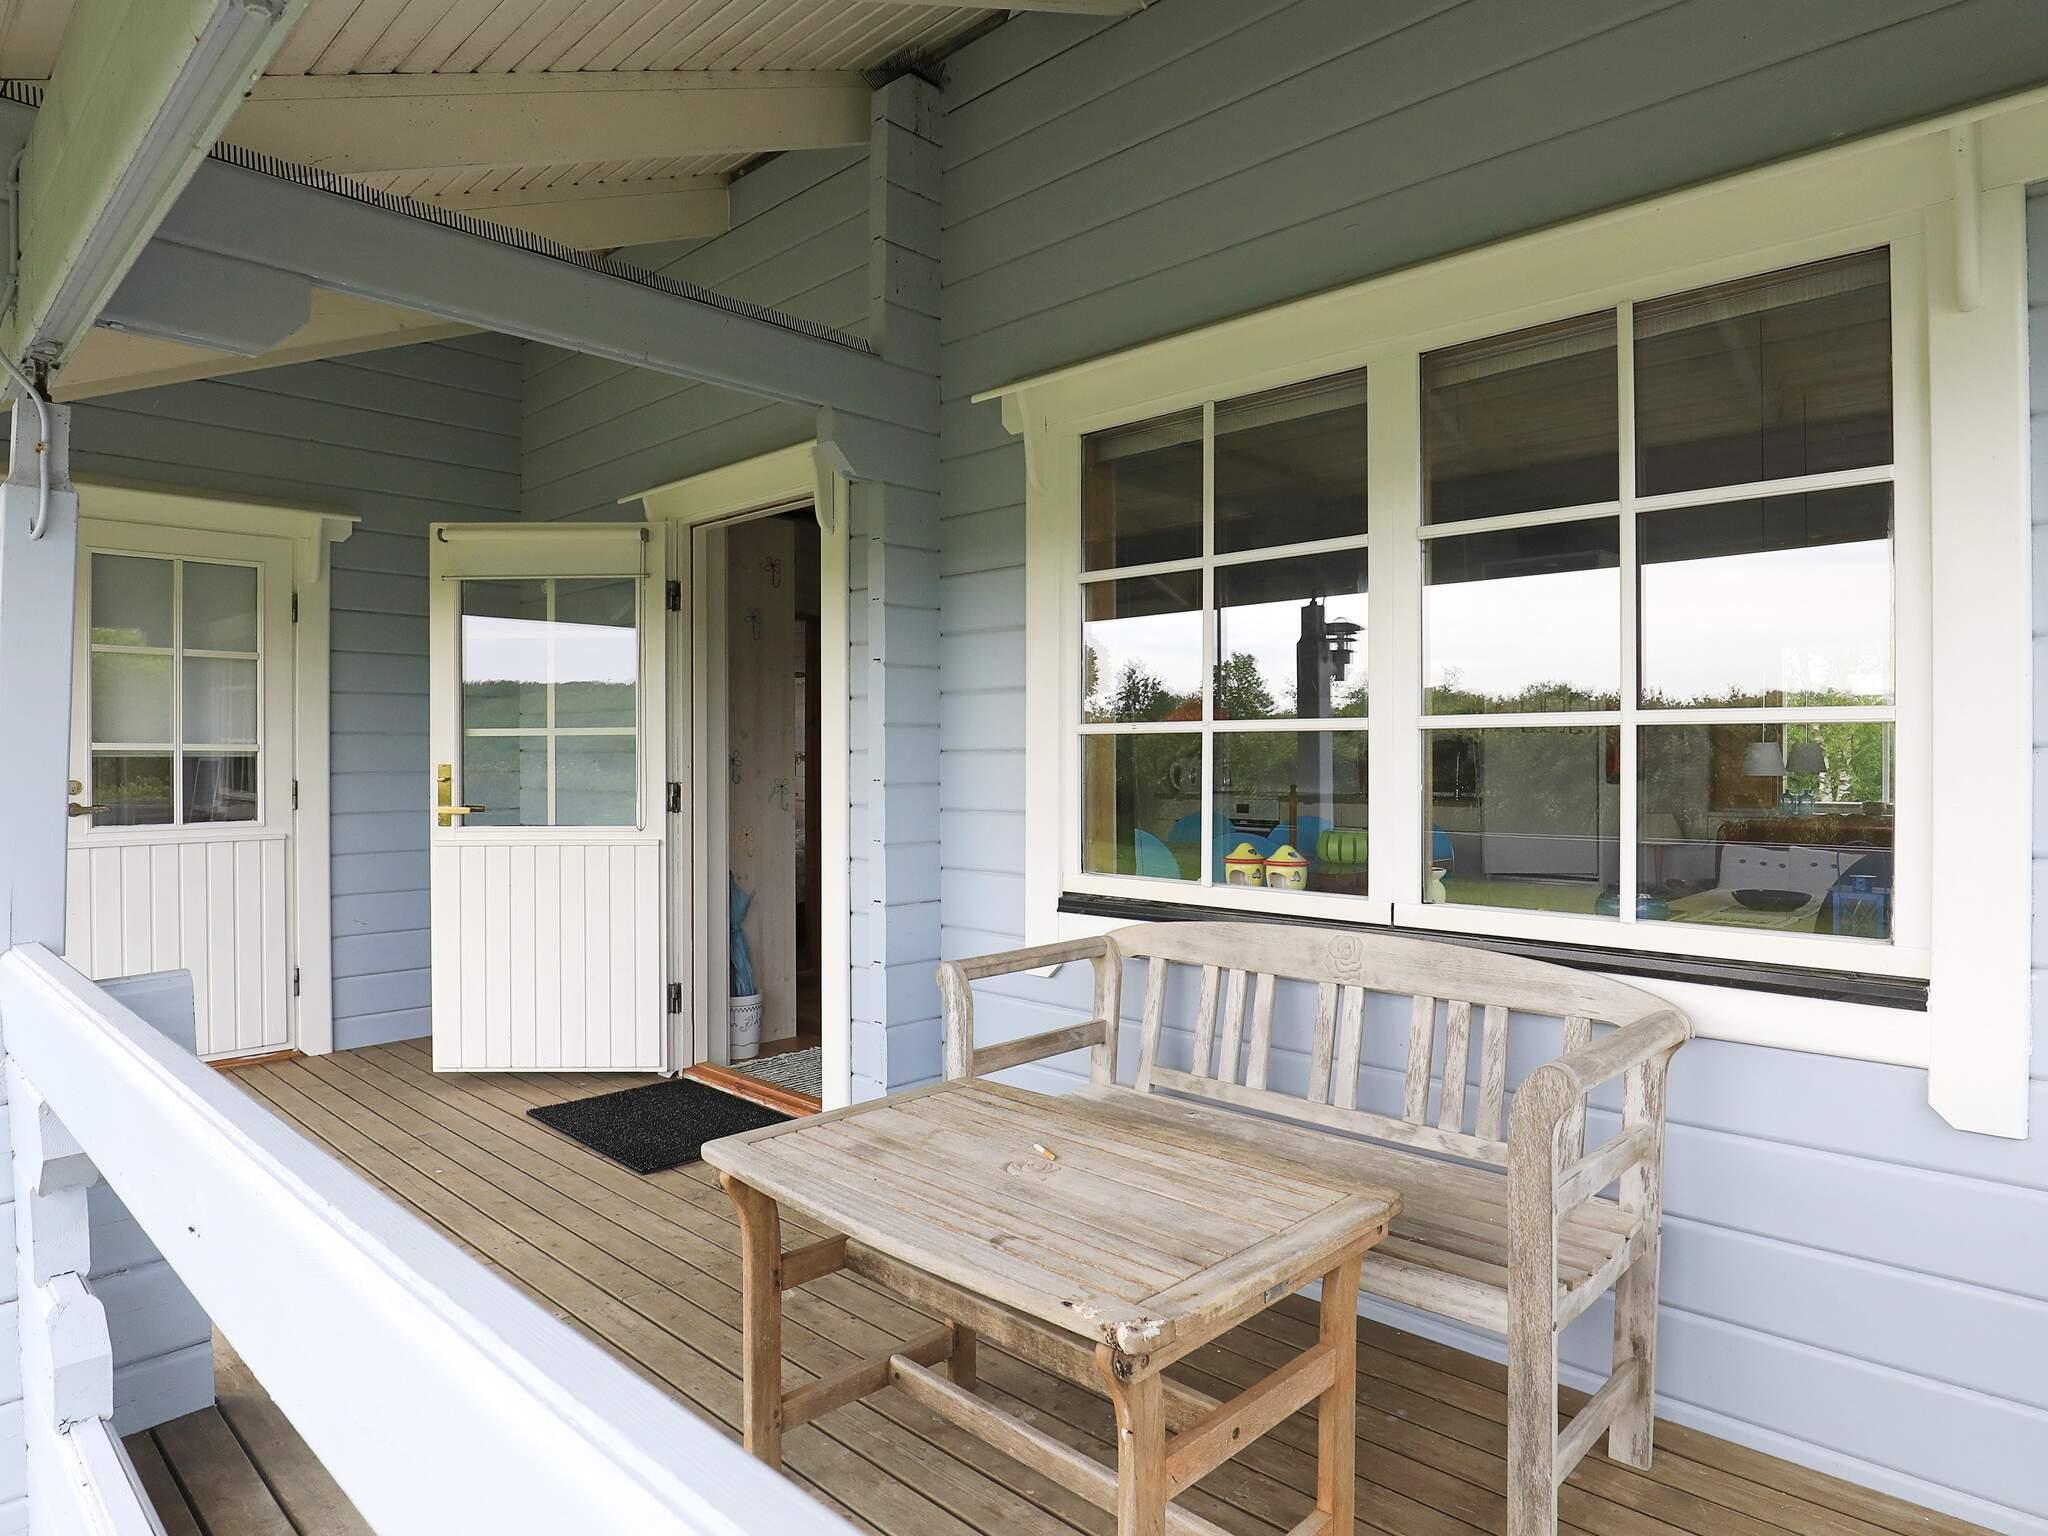 Maison de vacances Eskov Strandpark (603988), Roslev, , Limfjord, Danemark, image 11